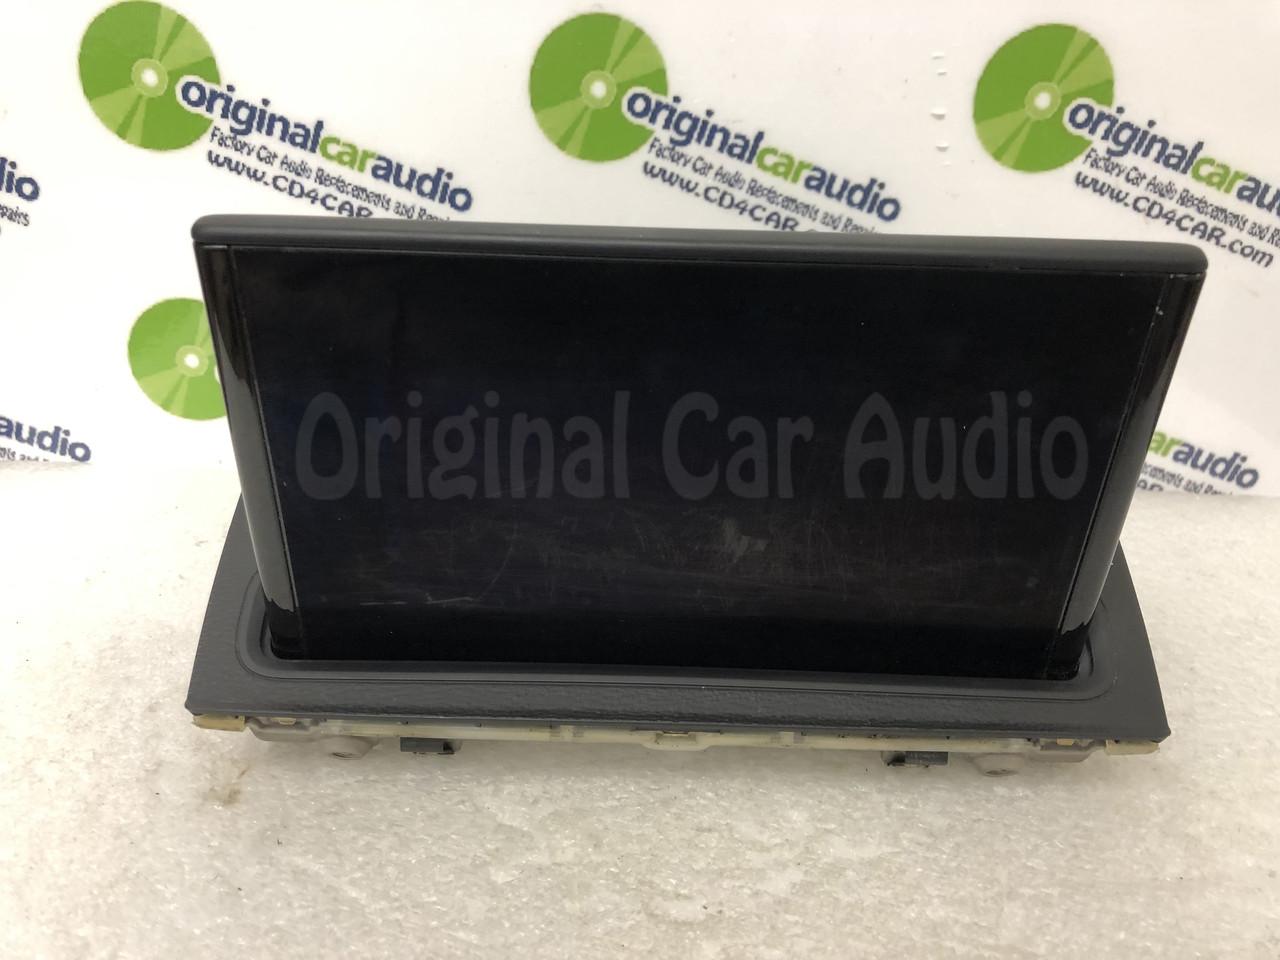 2015 - 2016 Audi A3 OEM Radio MMI Multimedia Information Display Screen  Monitor